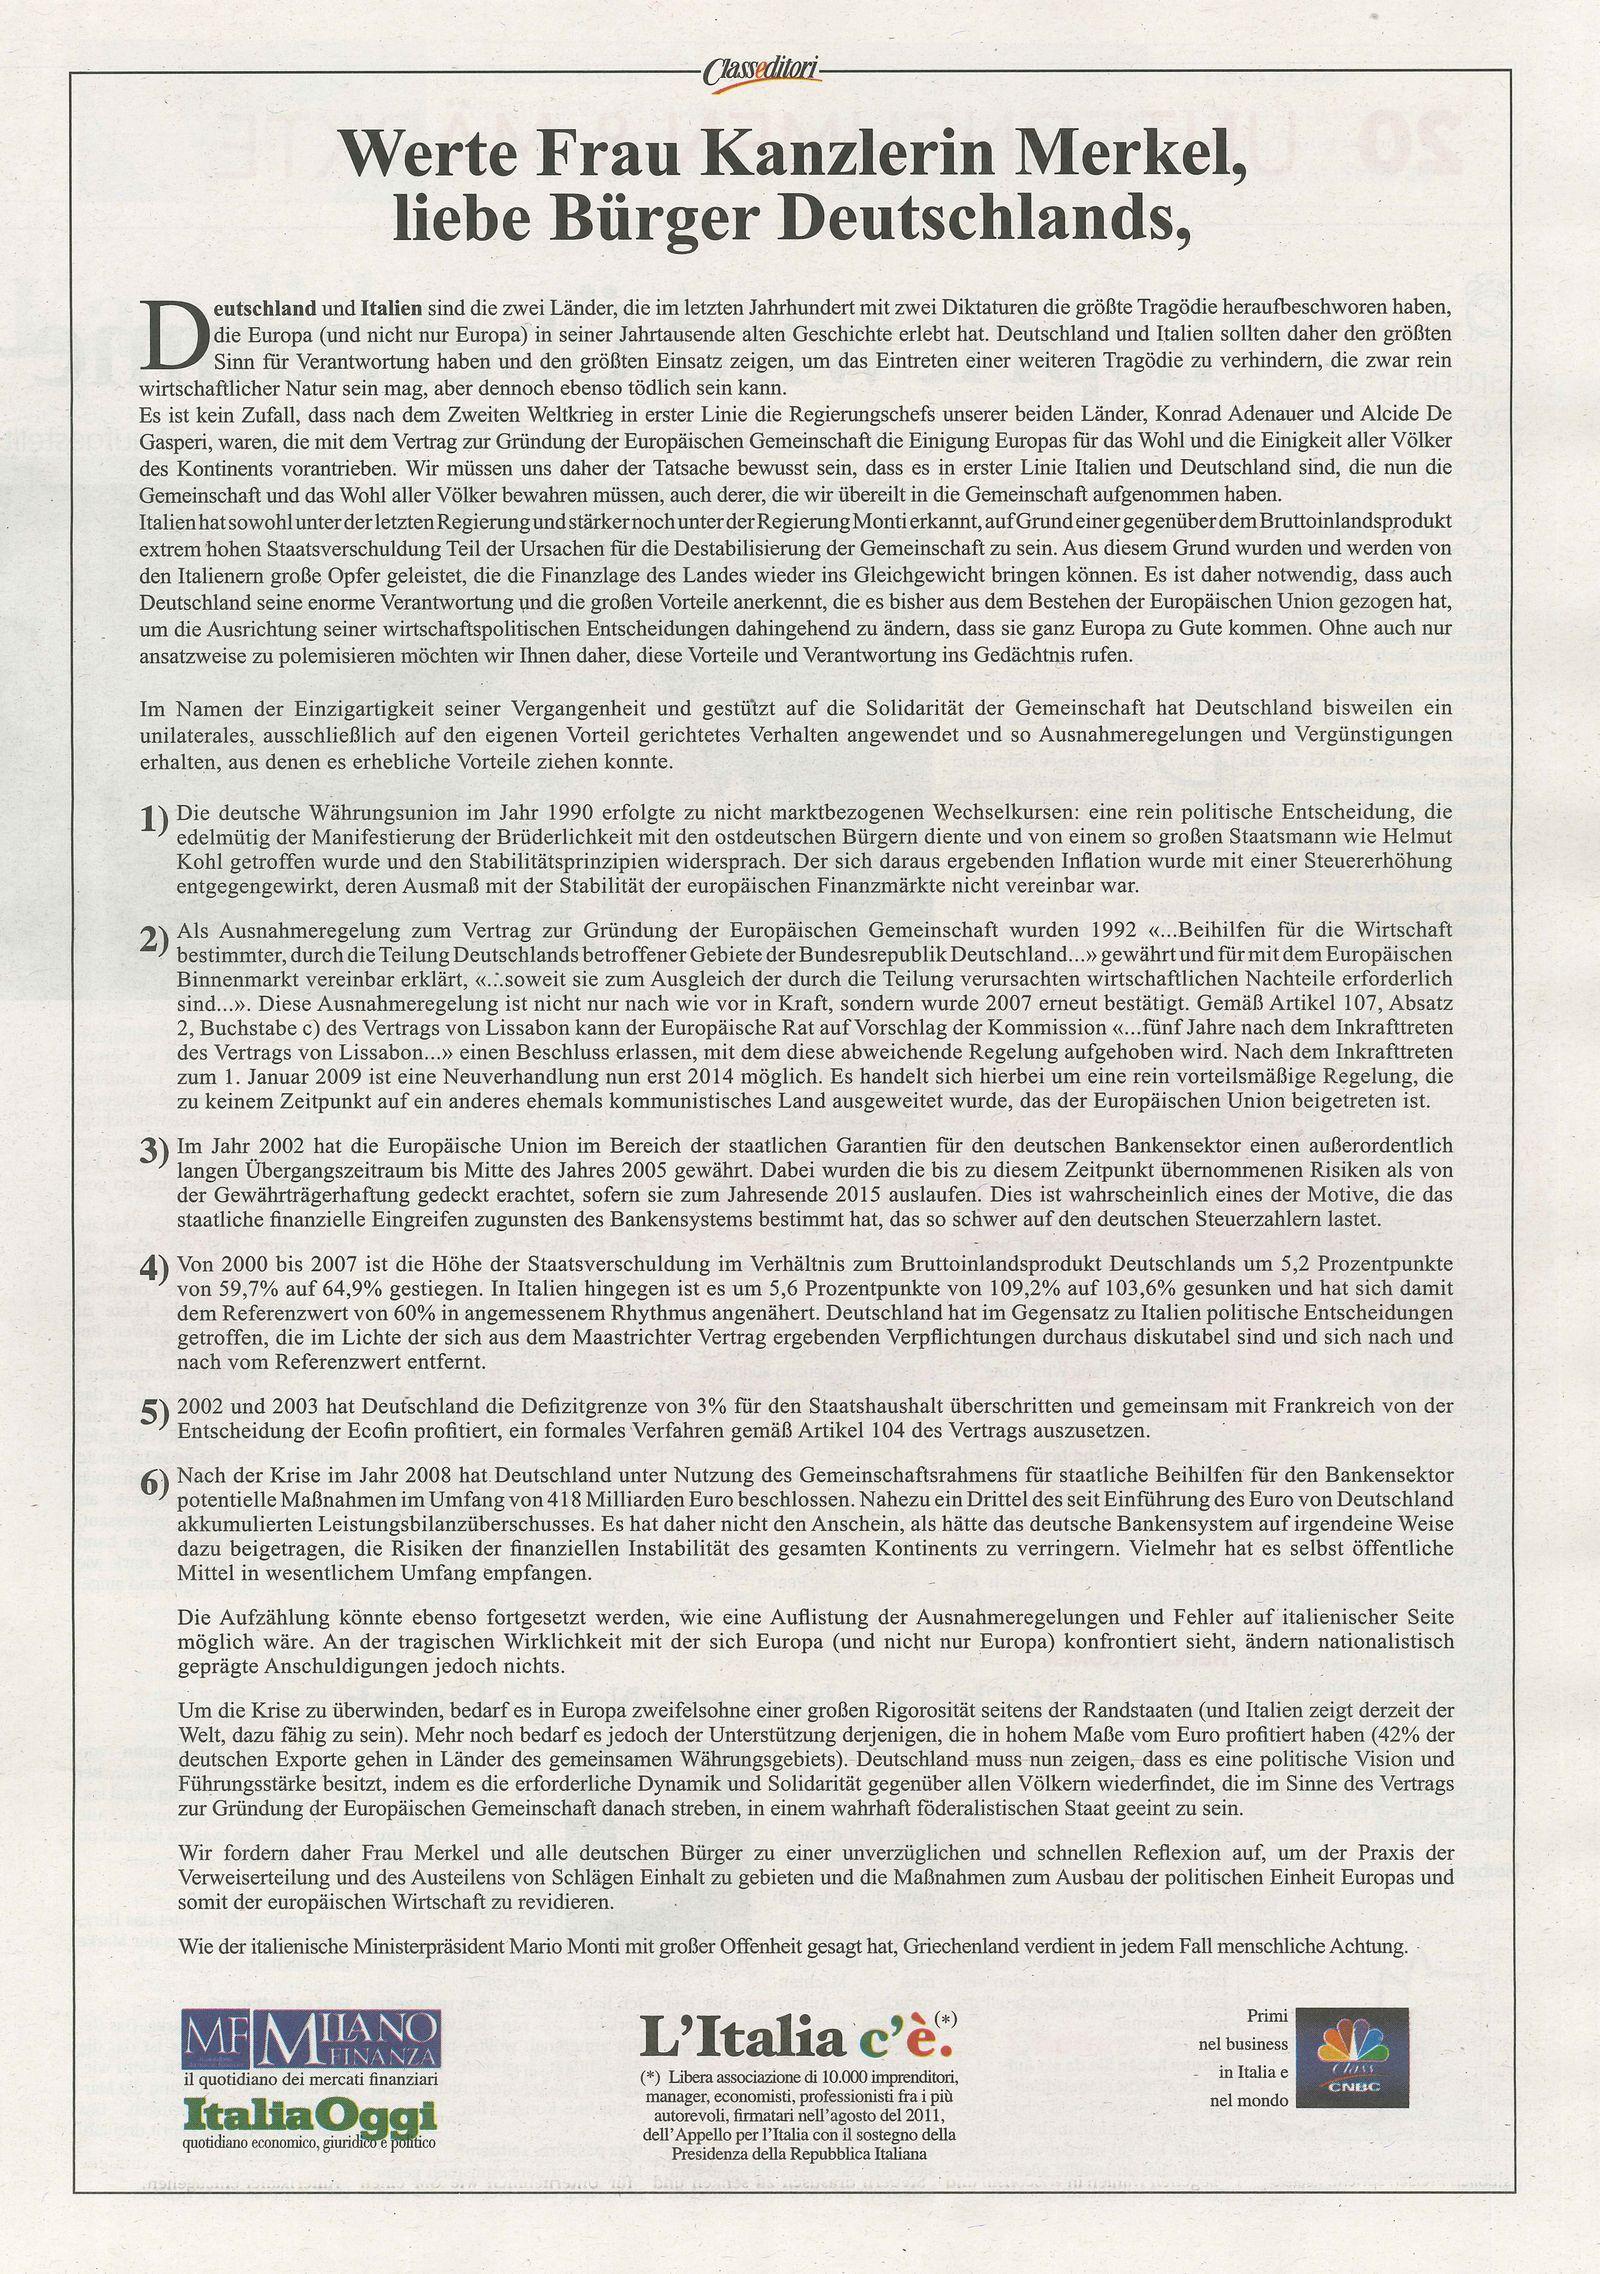 NUR ALS ZITAT Anzeige Handelsblatt / Italien